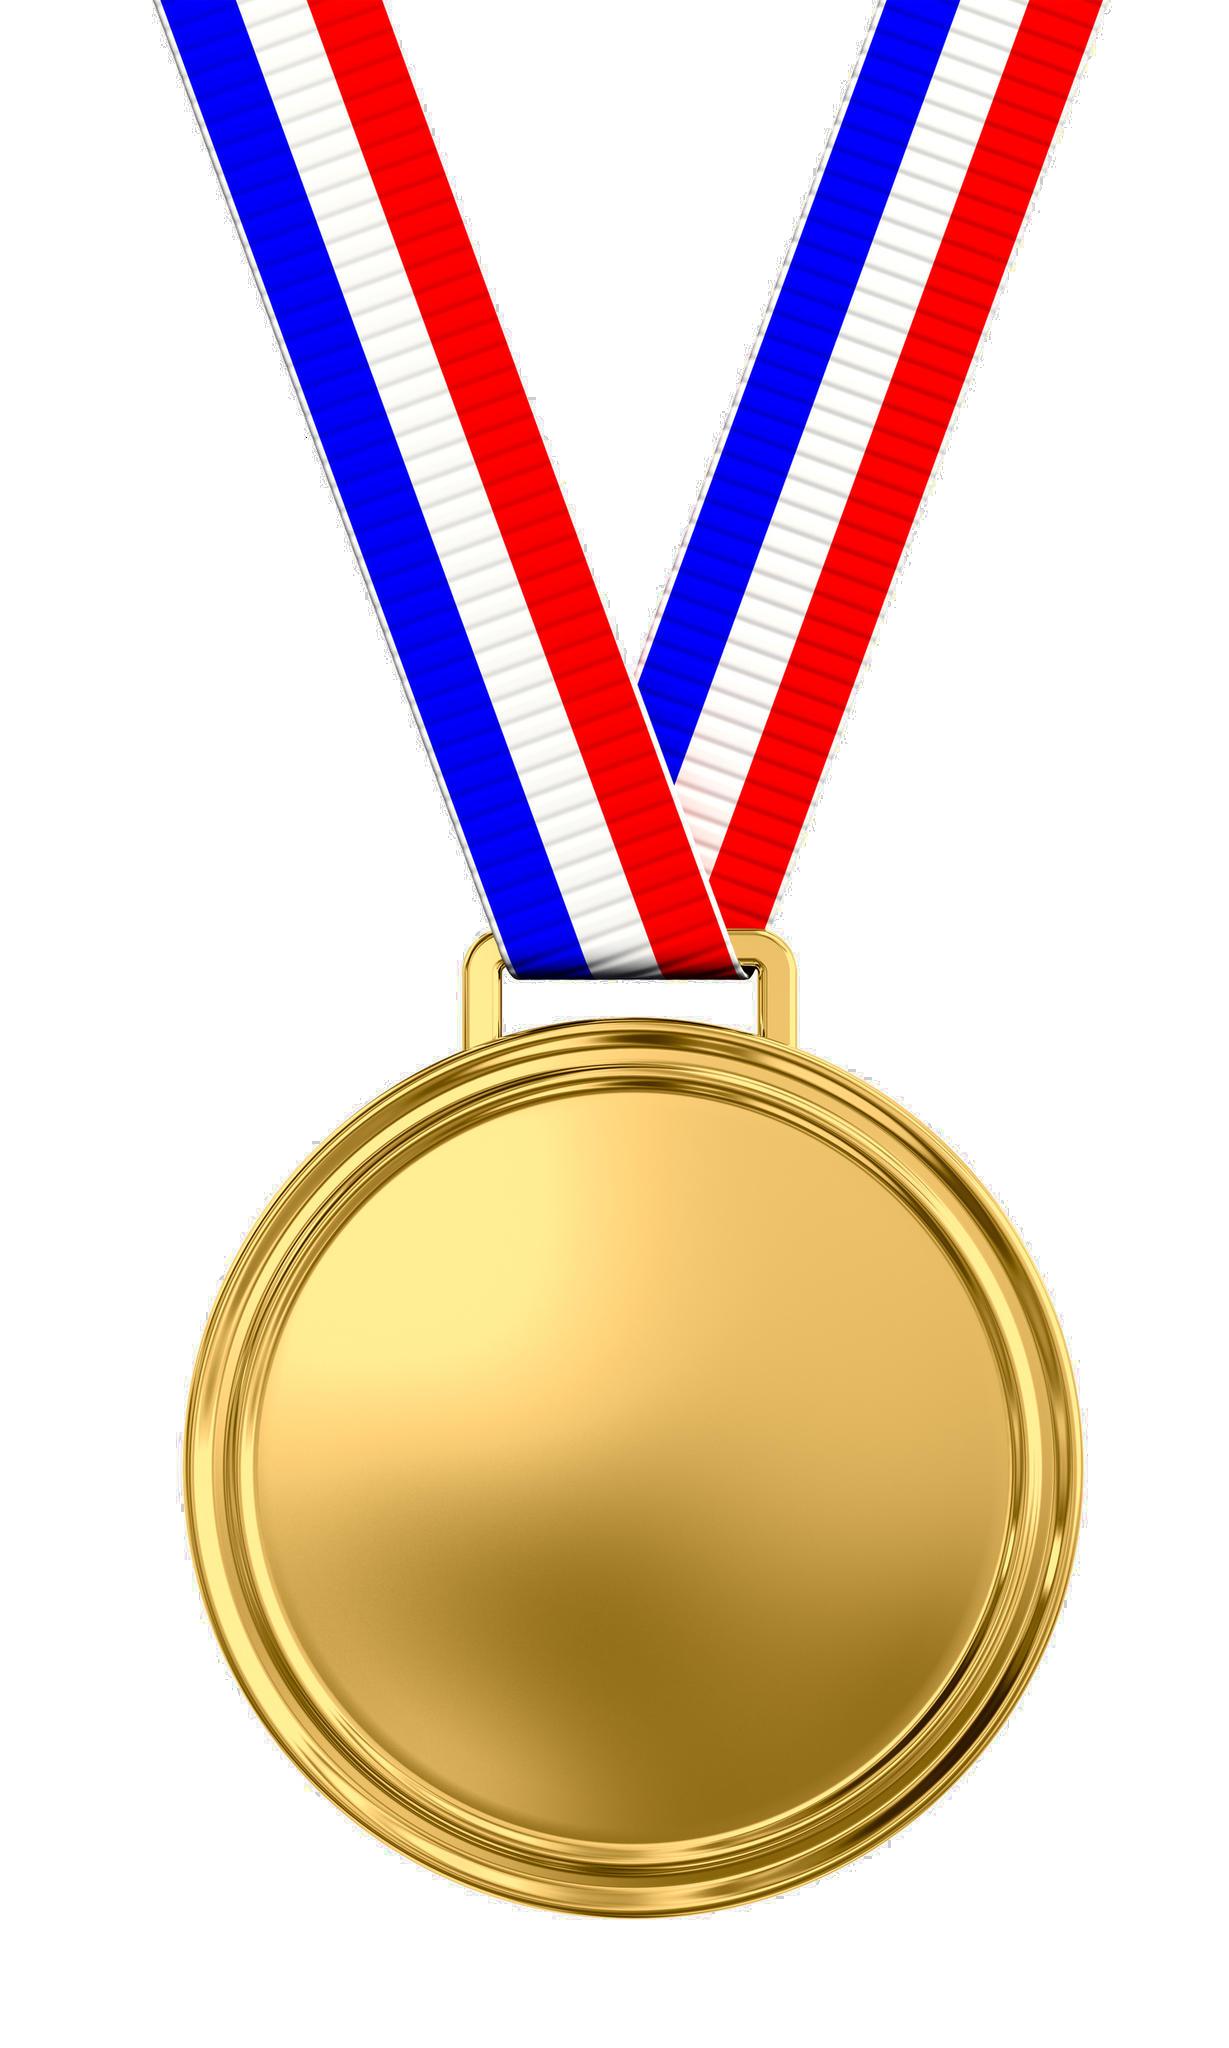 Overwatch gold medal png. Award transparent images pluspng